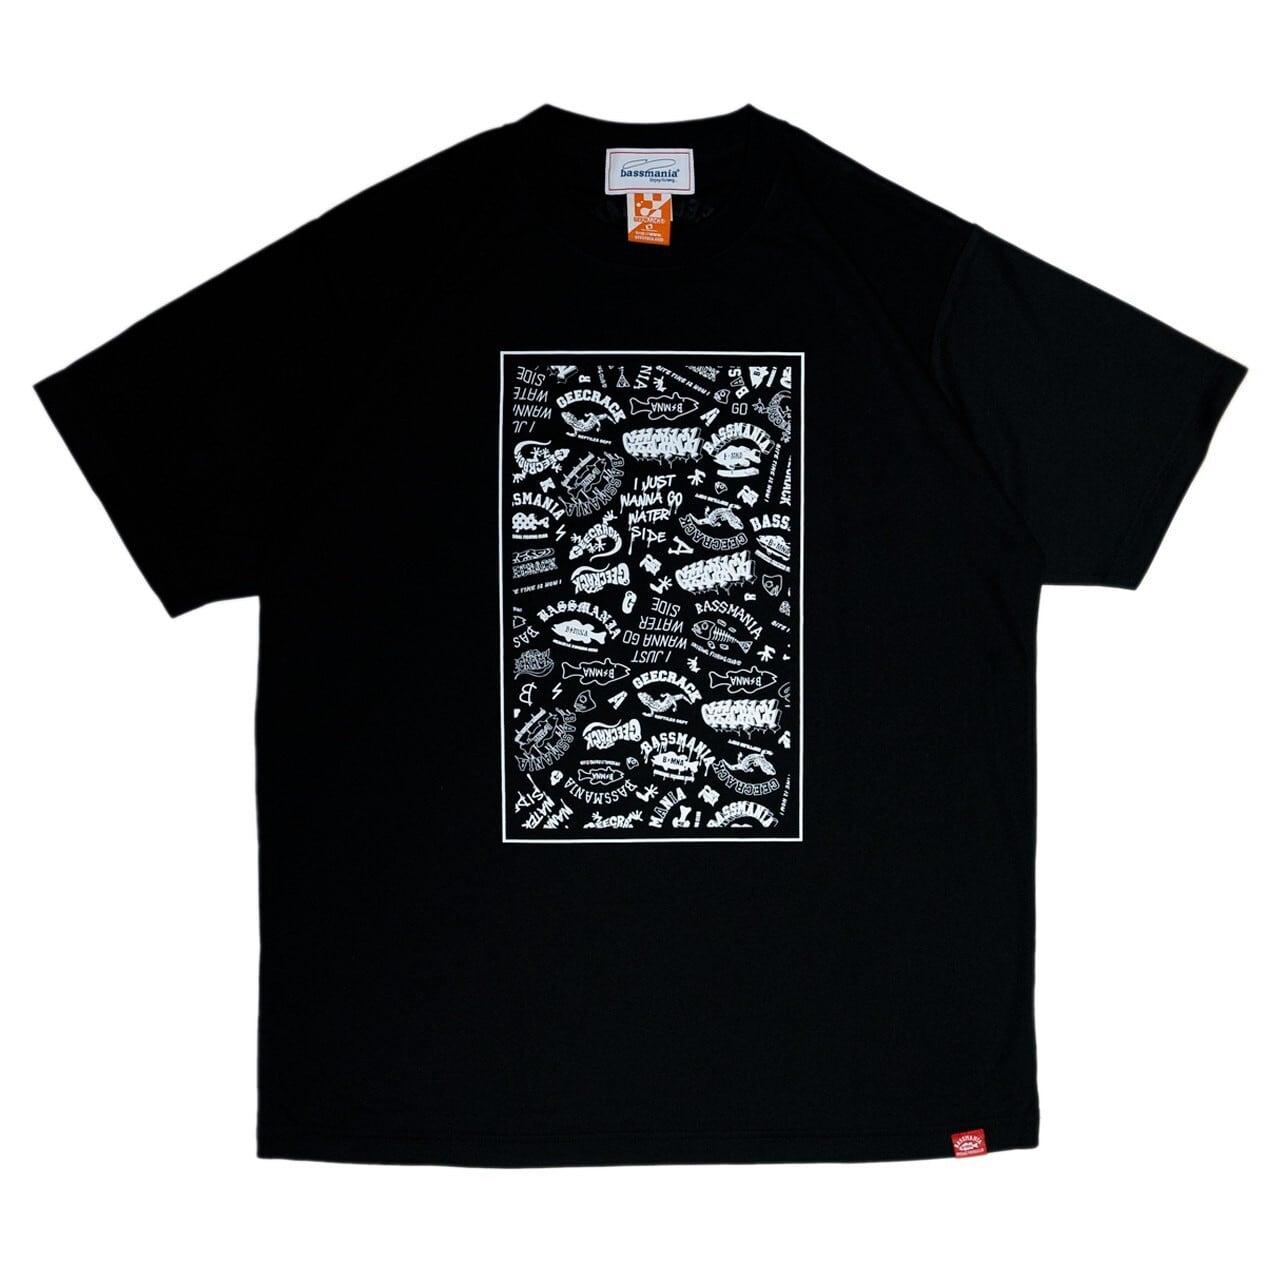 【bassmania×GEECRACK】ランダムロゴ dry UV Tシャツ [BLK]  [限定生産] [8月上旬配送]